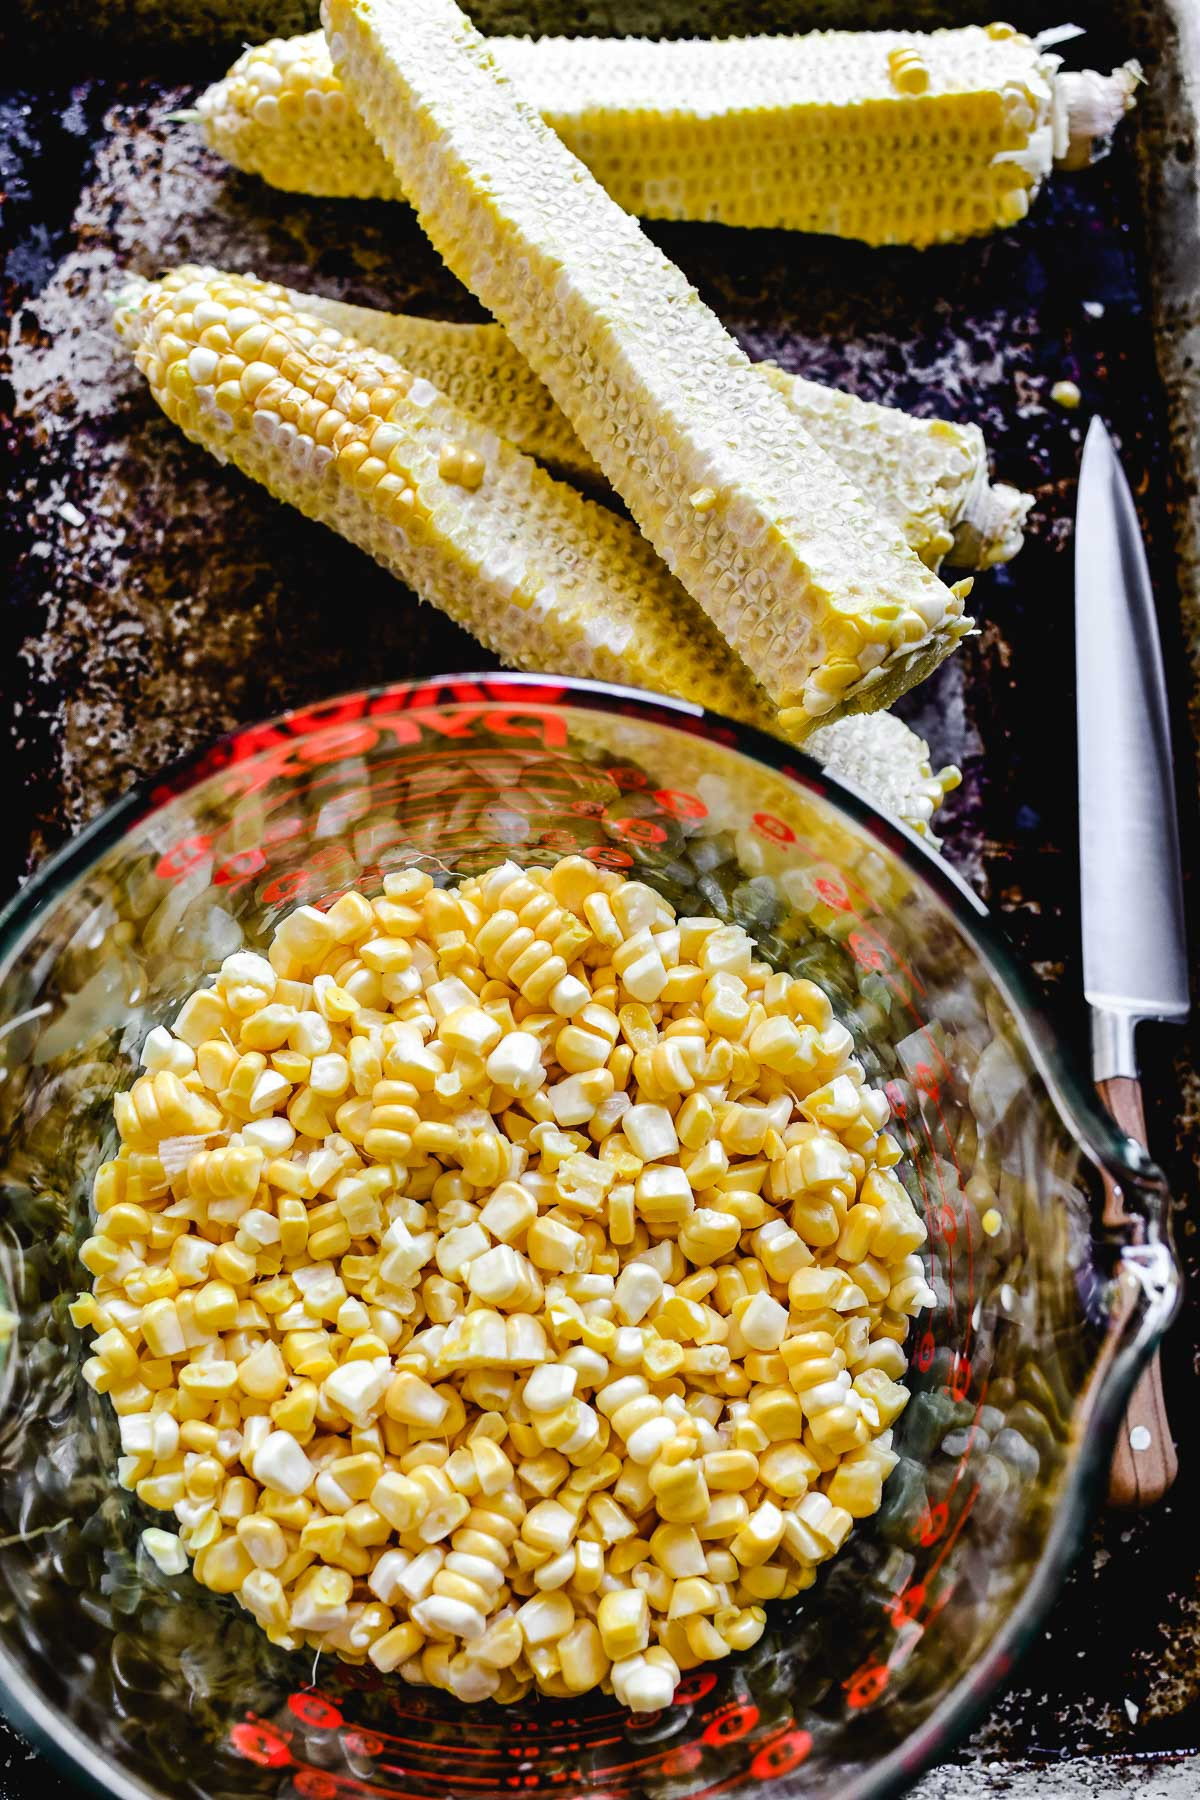 Fresh corn kernels in a bowl